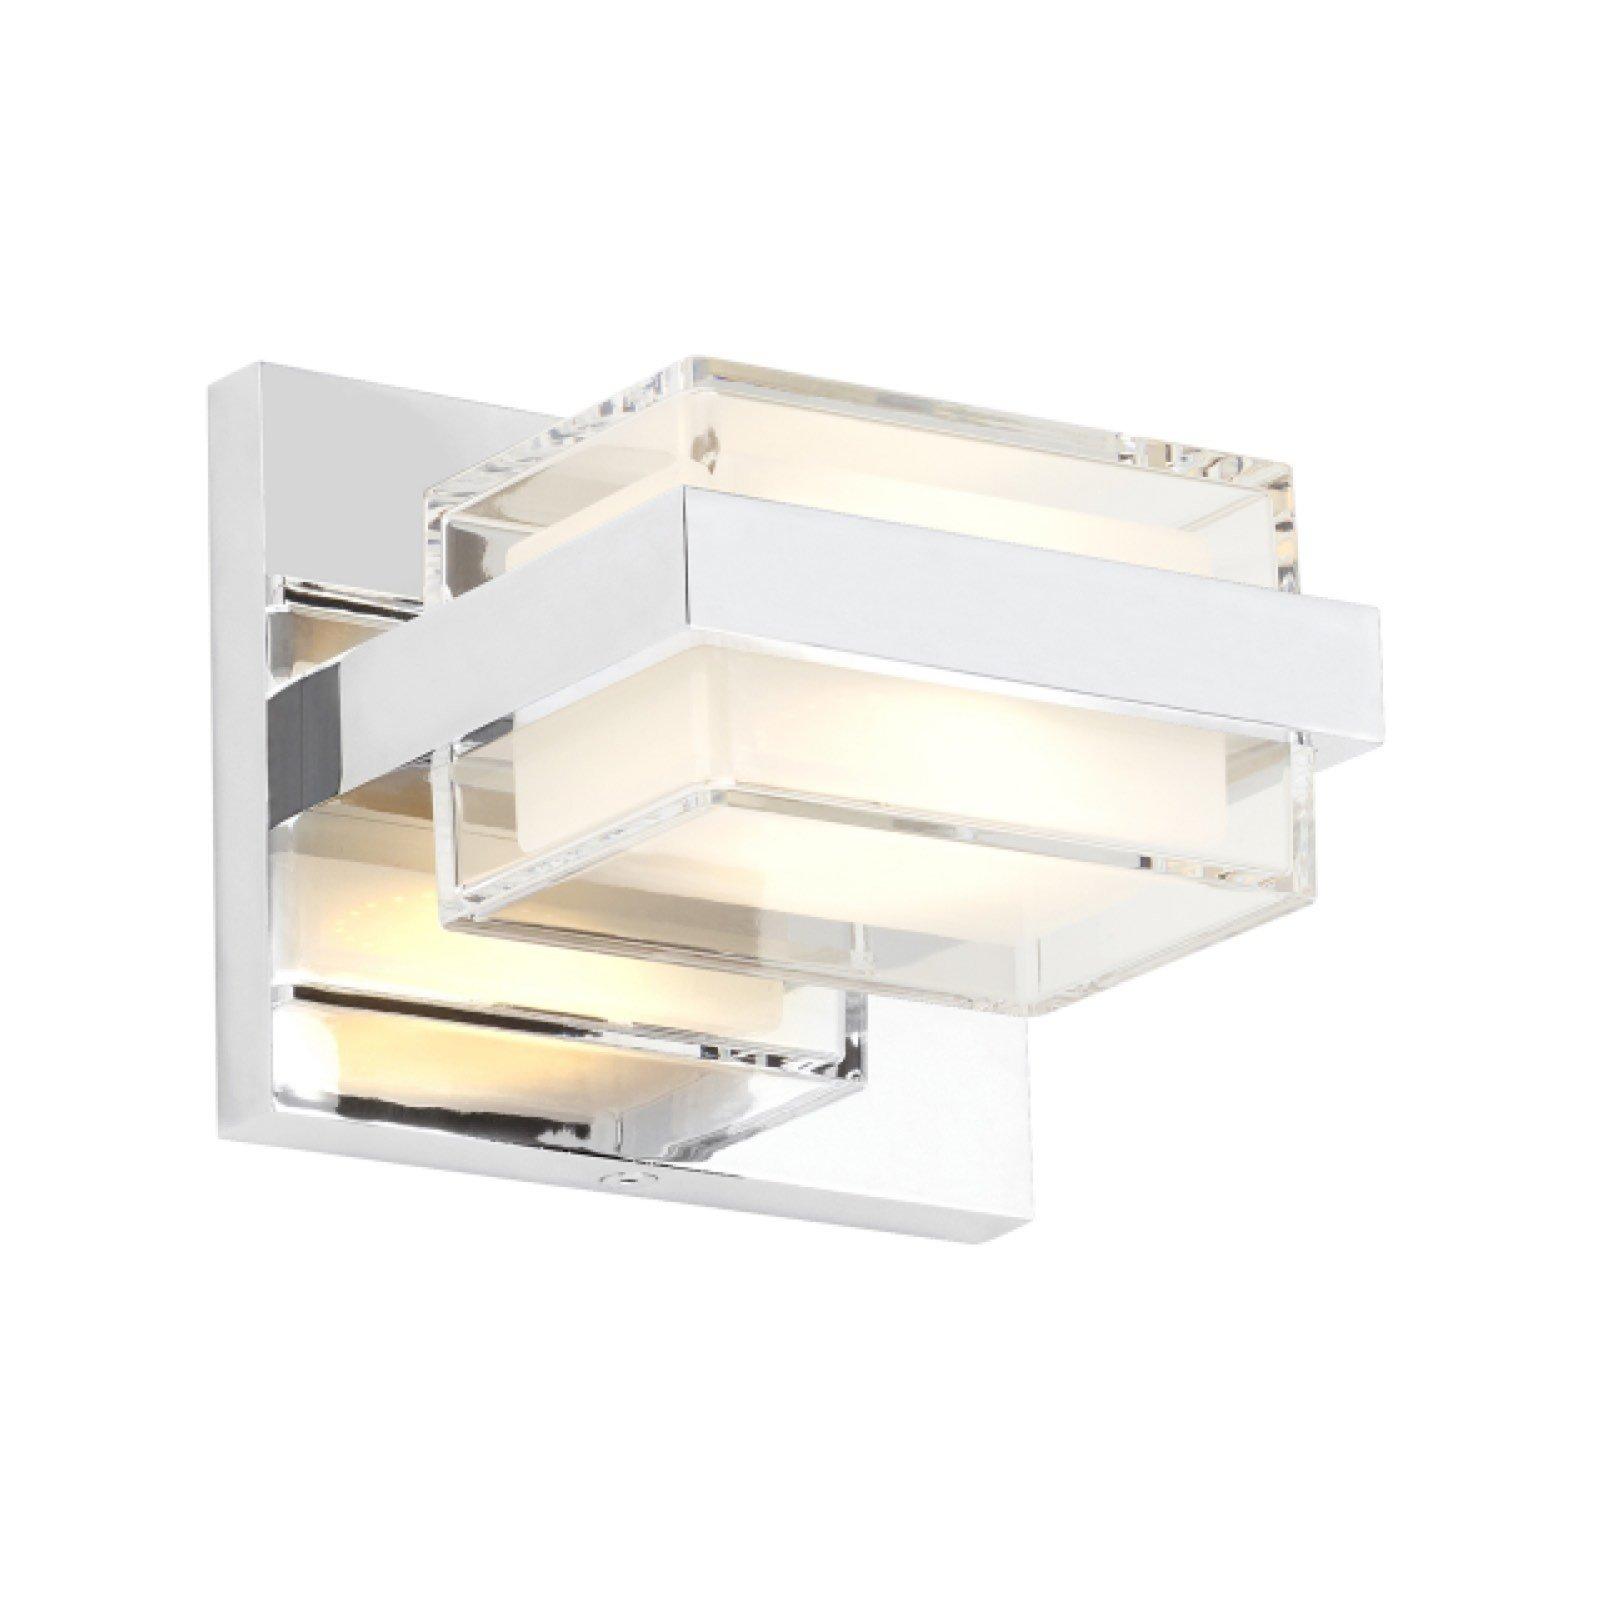 Circa Lighting Kamden 1-Light Wall/Bath Sconce